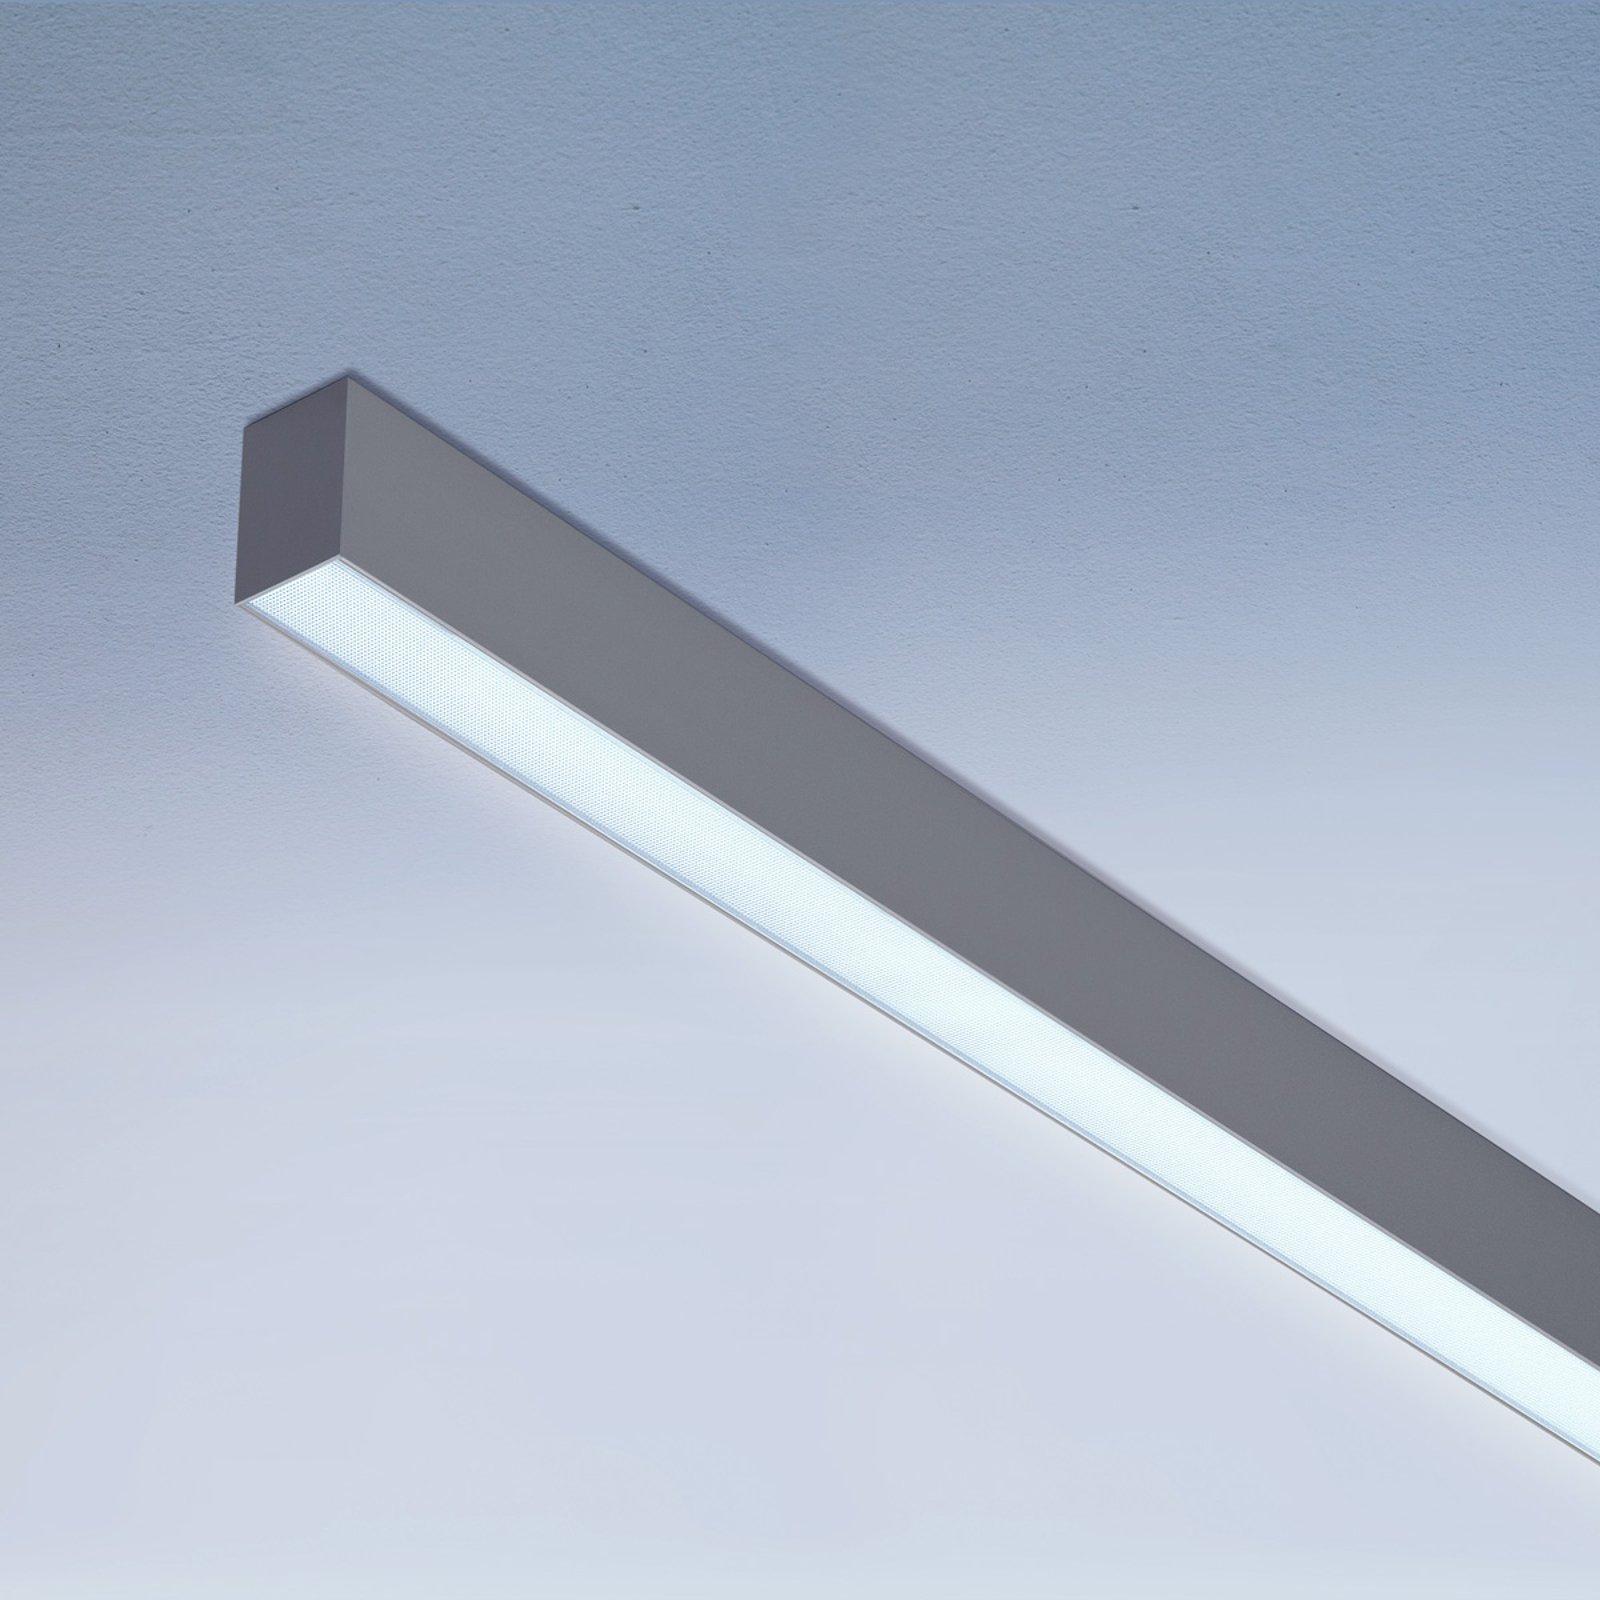 Medium Power Matric-A3 - LED-vegglampe 293 cm